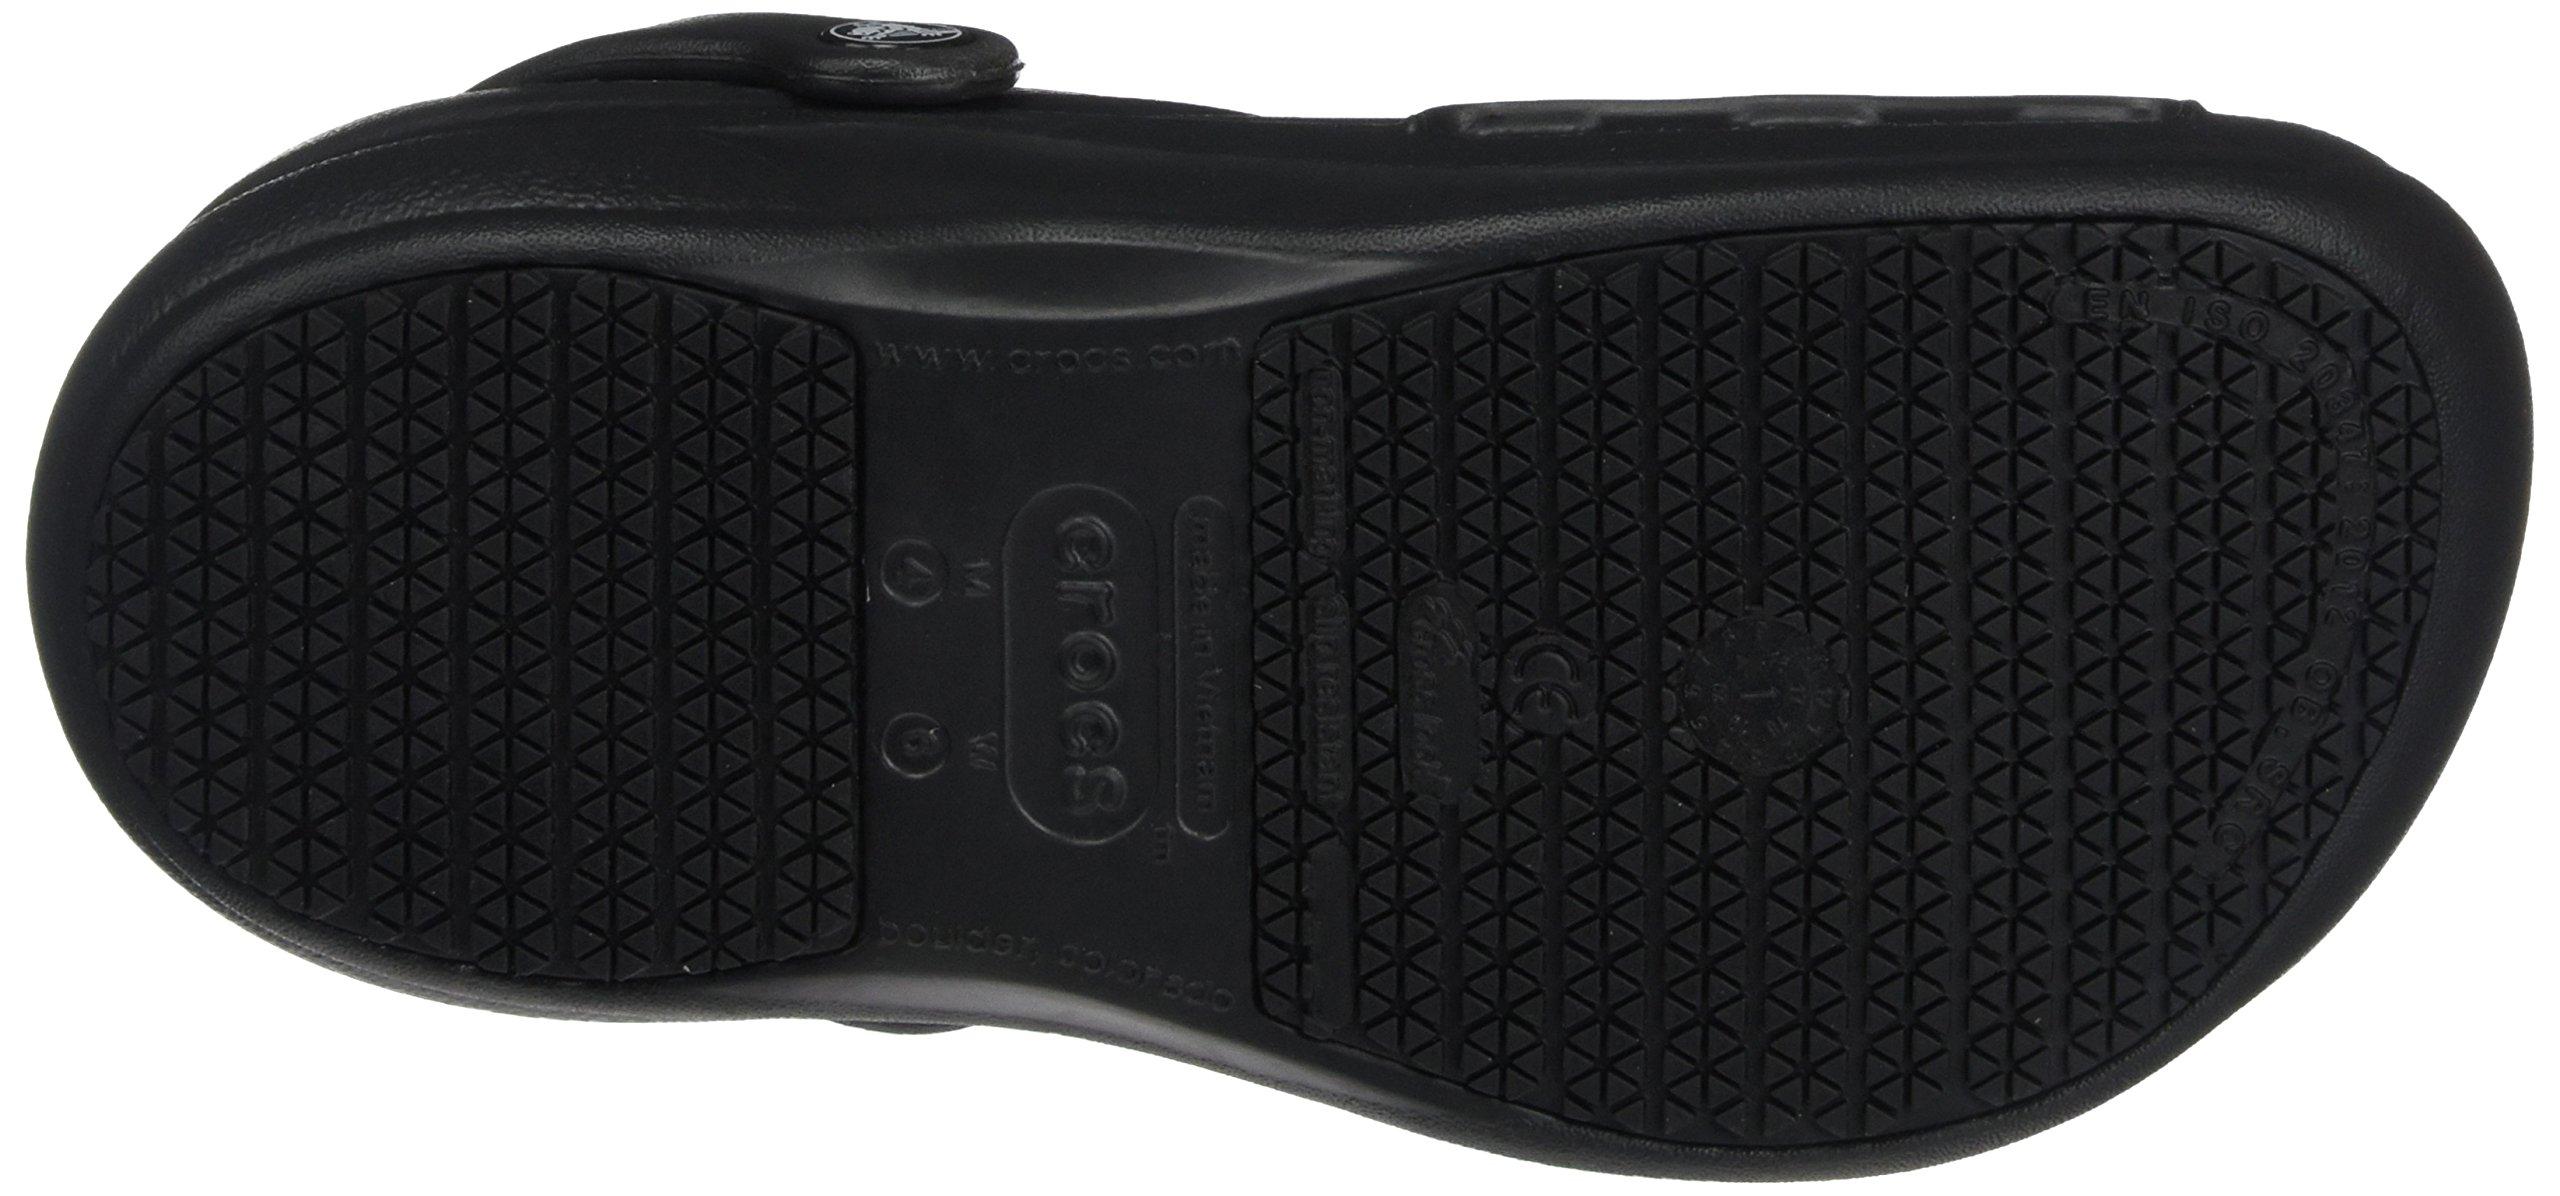 Crocs Bistro Graphic Clog, Unisex Adulto Zueco, Multicolor (Black/Multi), 36-37 EU